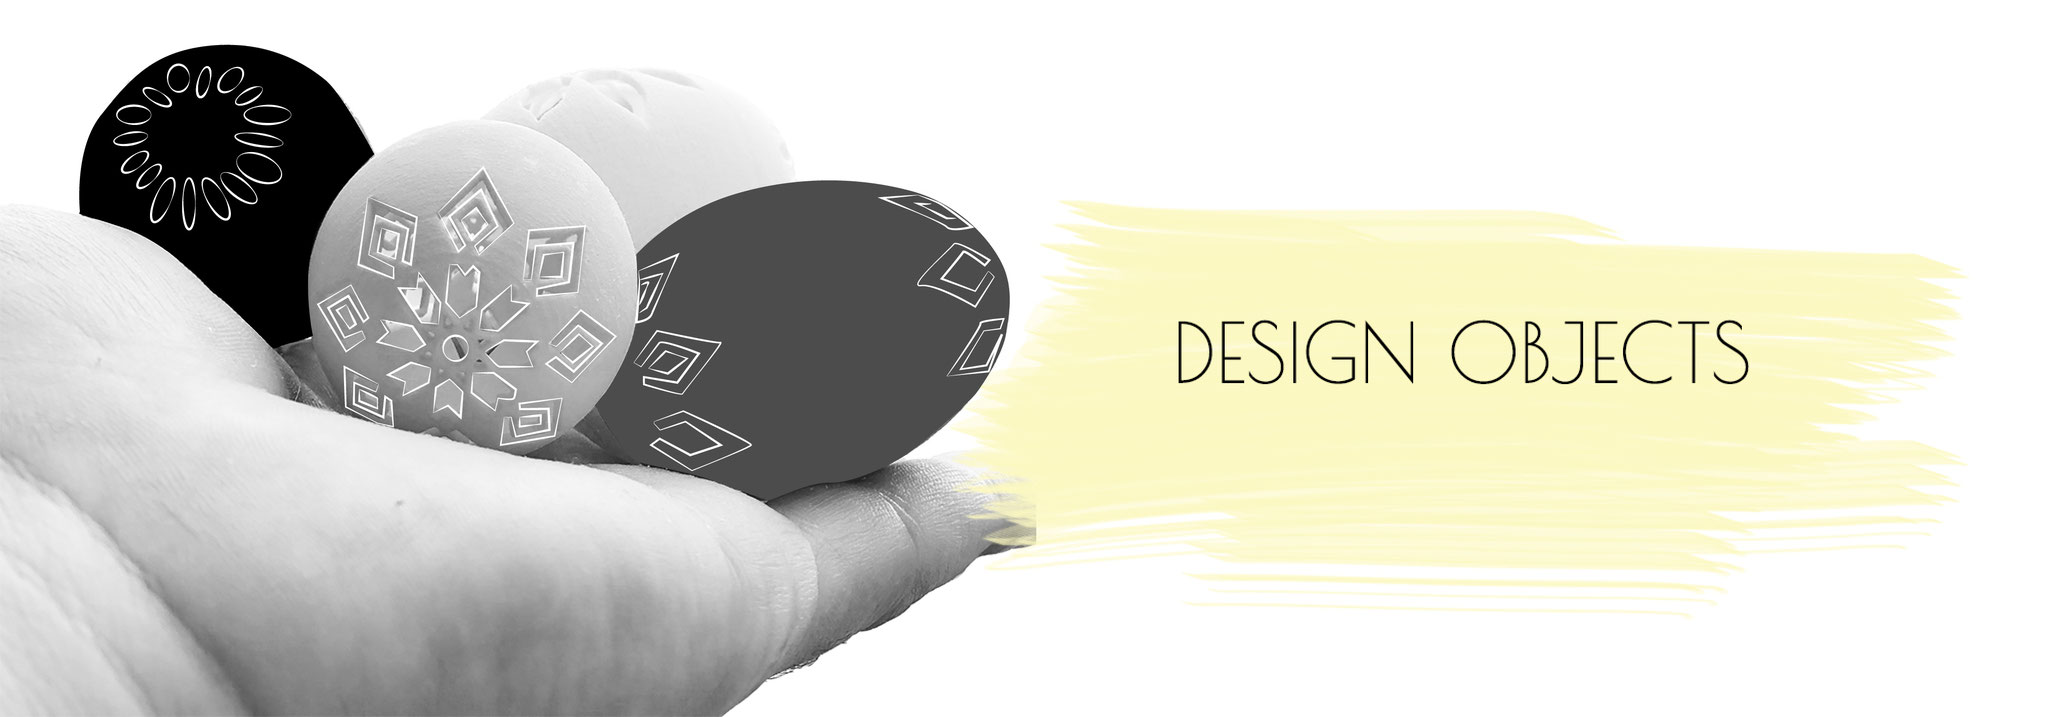 Contemporary design objects by Nobahar Design Milano - Design contemporaneo